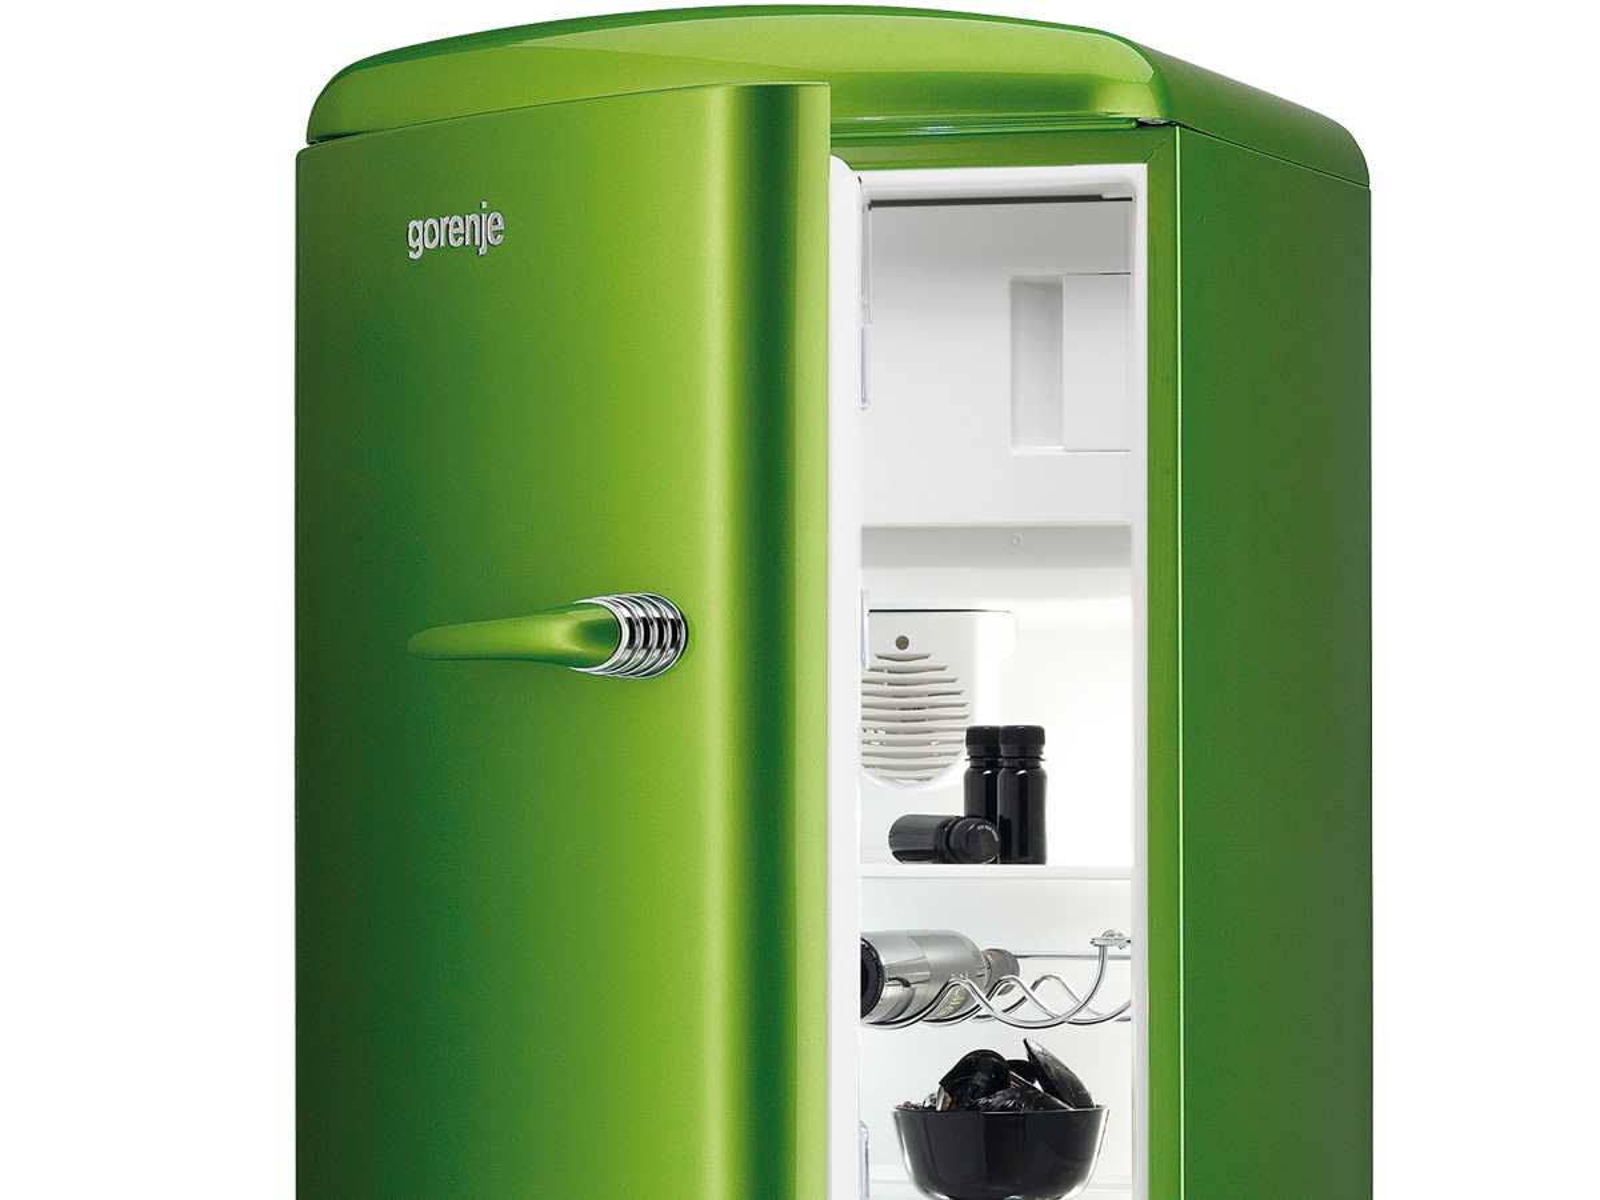 Smeg Kühlschrank Handbuch : Smeg grun retro kühlschrank dion debra blog